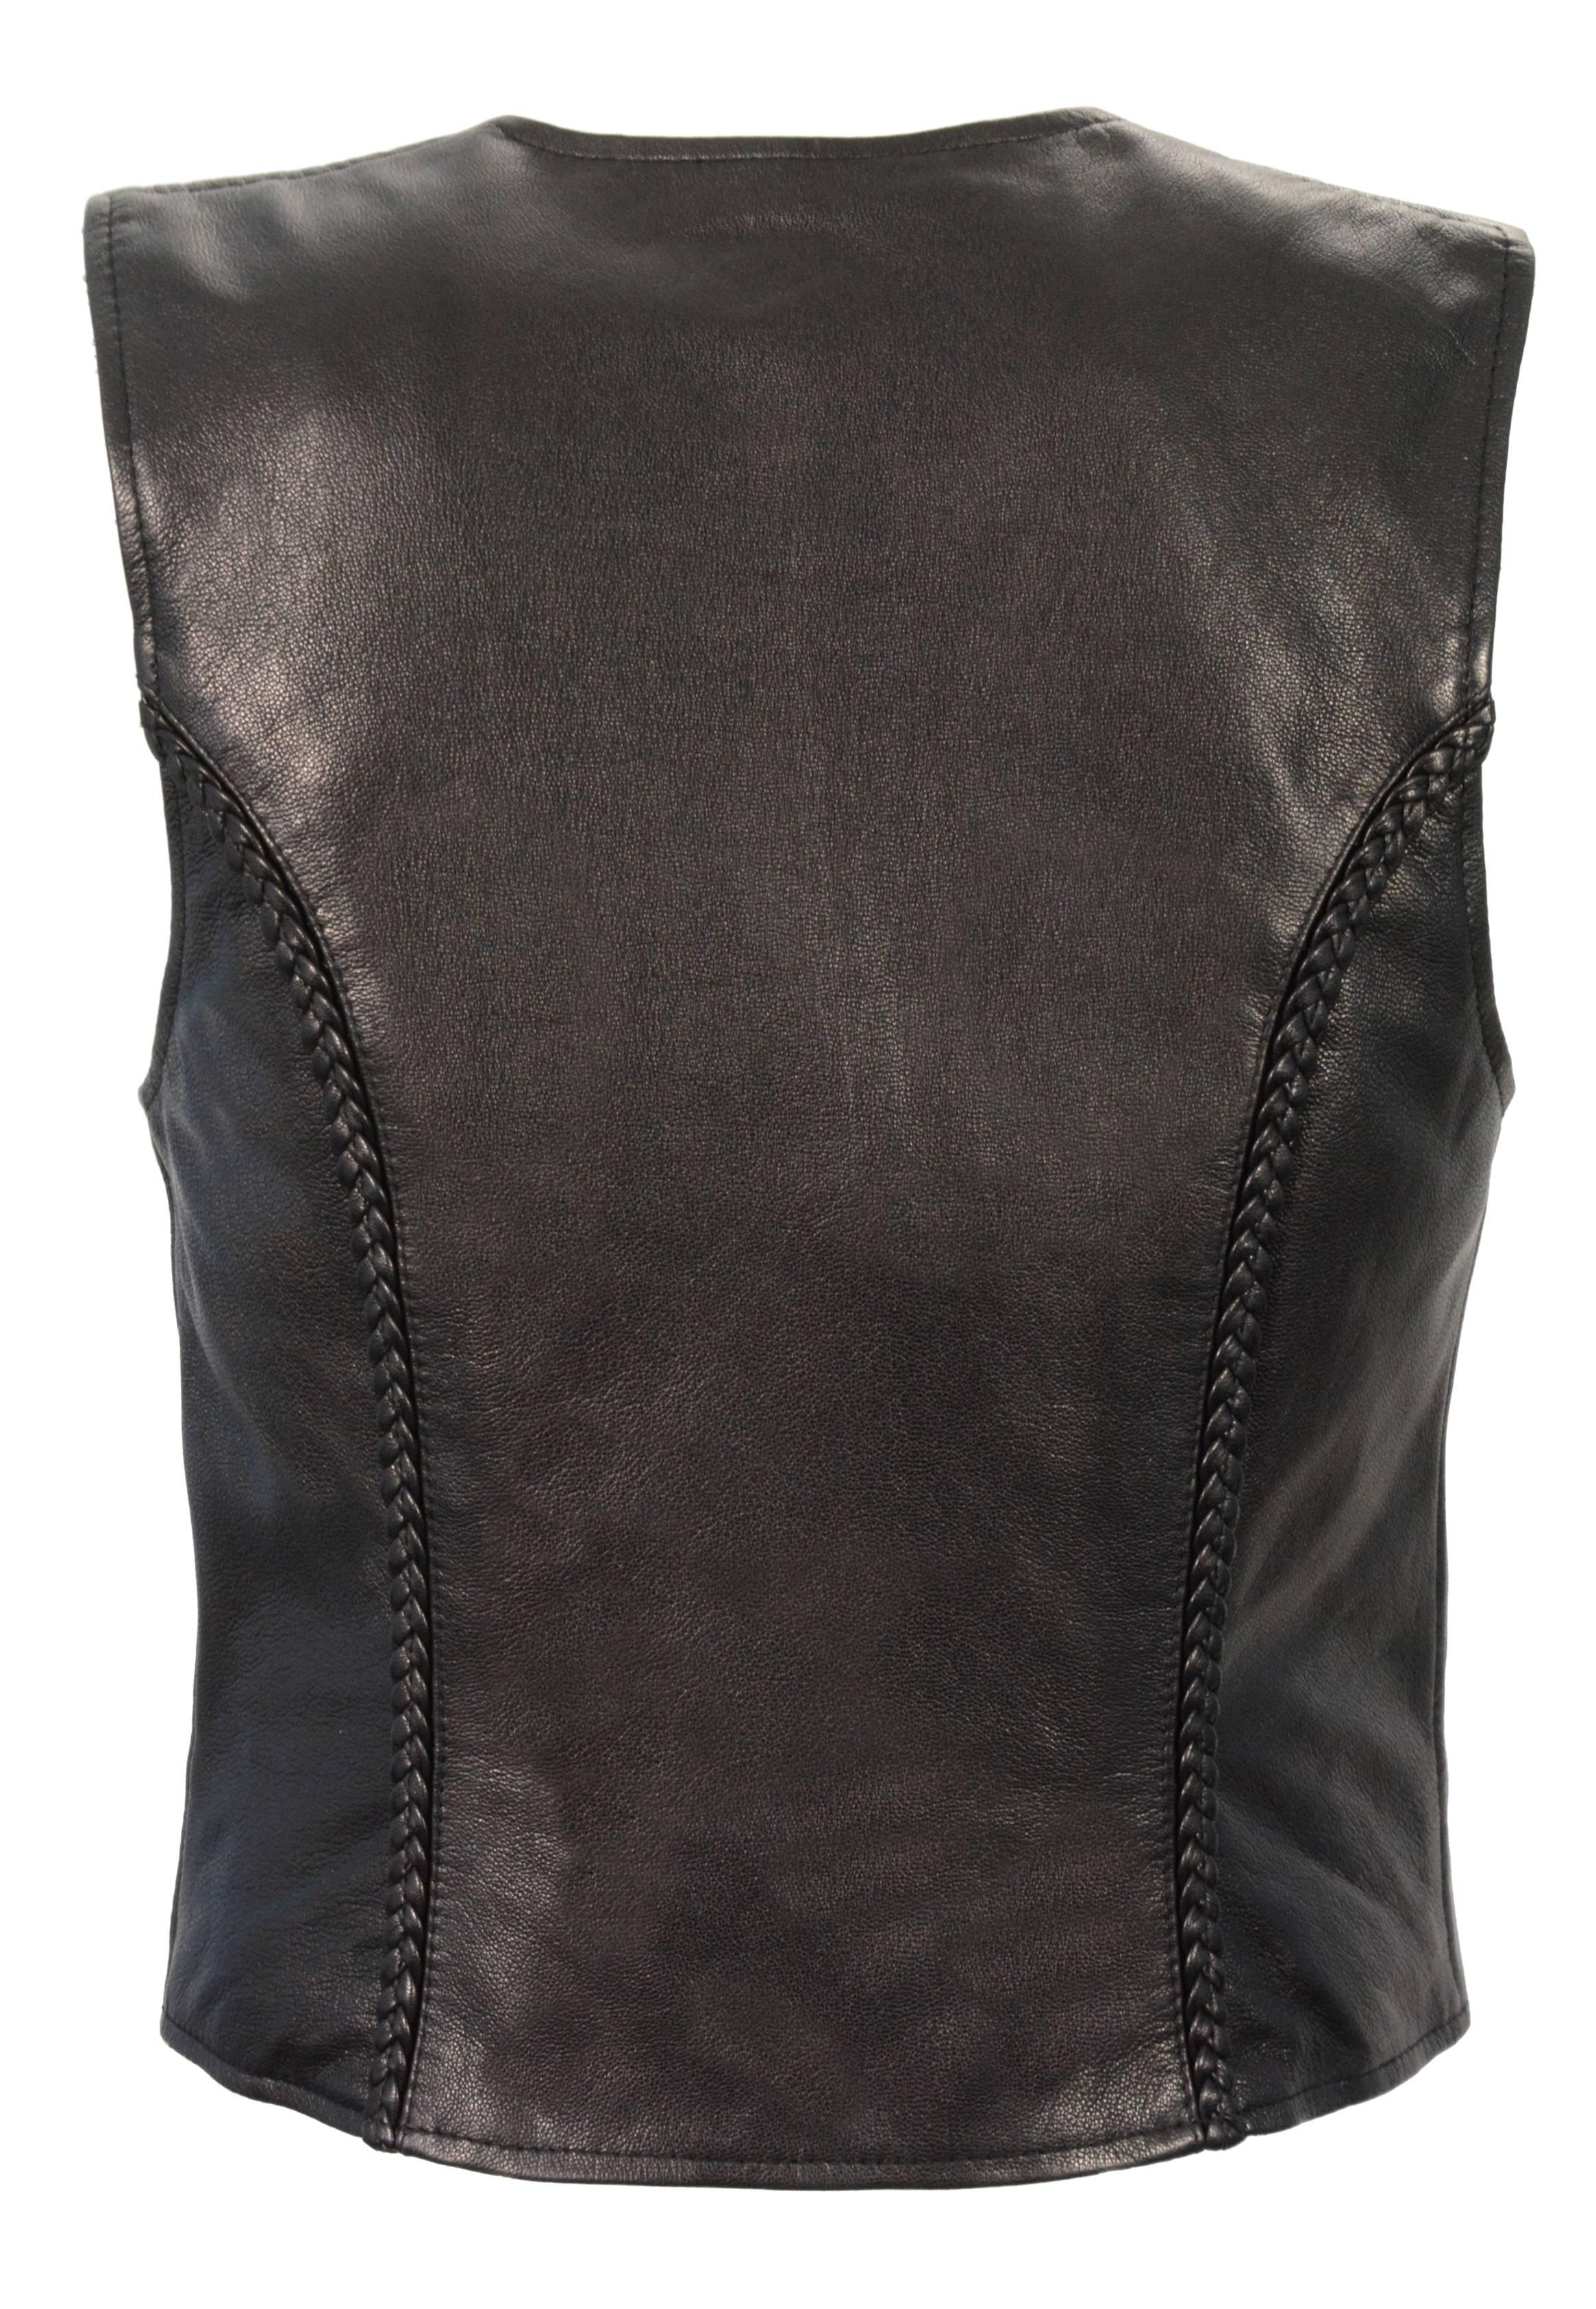 Ladies Black Naked Goatskin Leather Biker Vest, Light